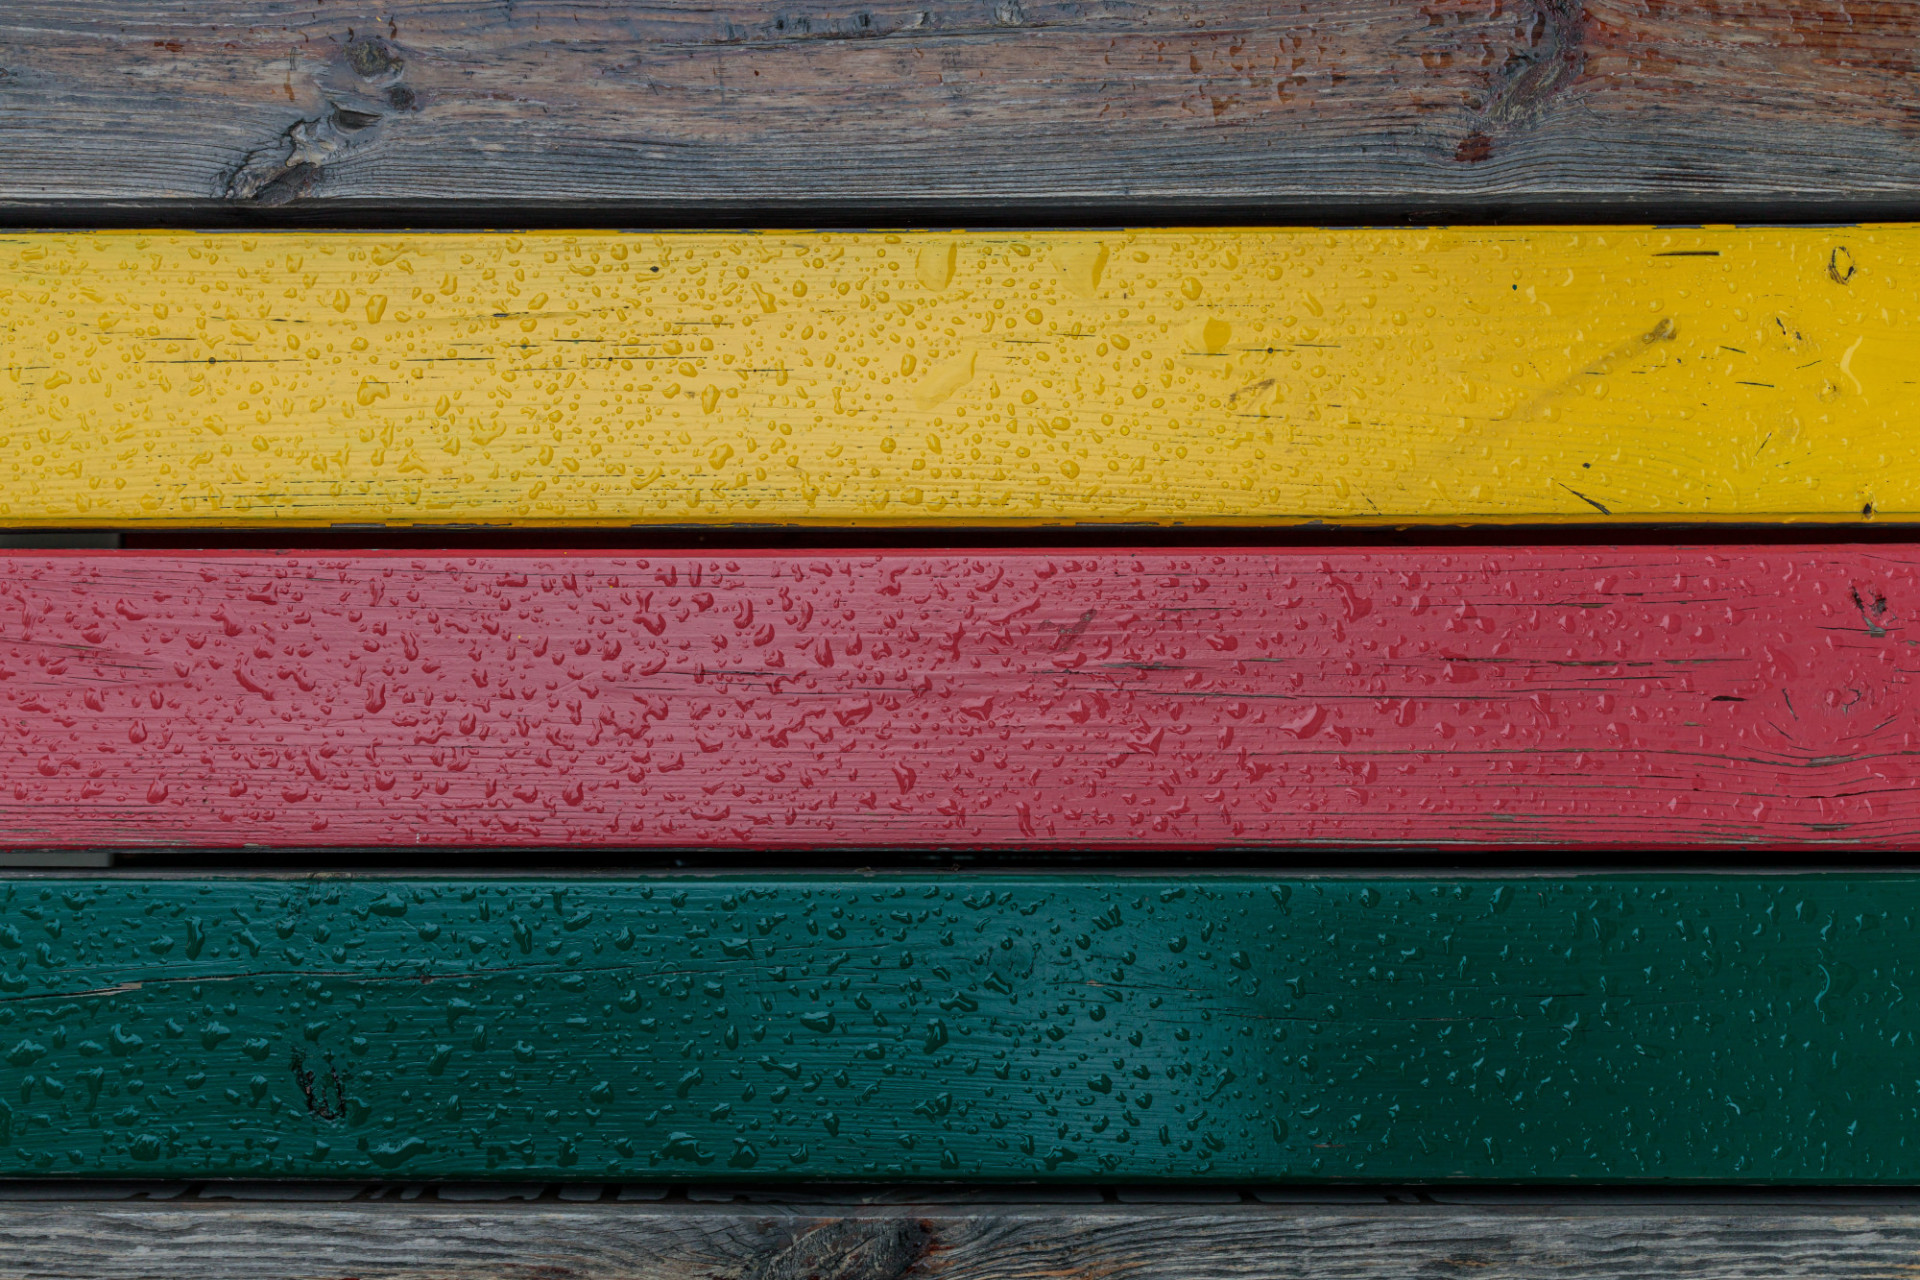 Rain wet motley wooden wall texture